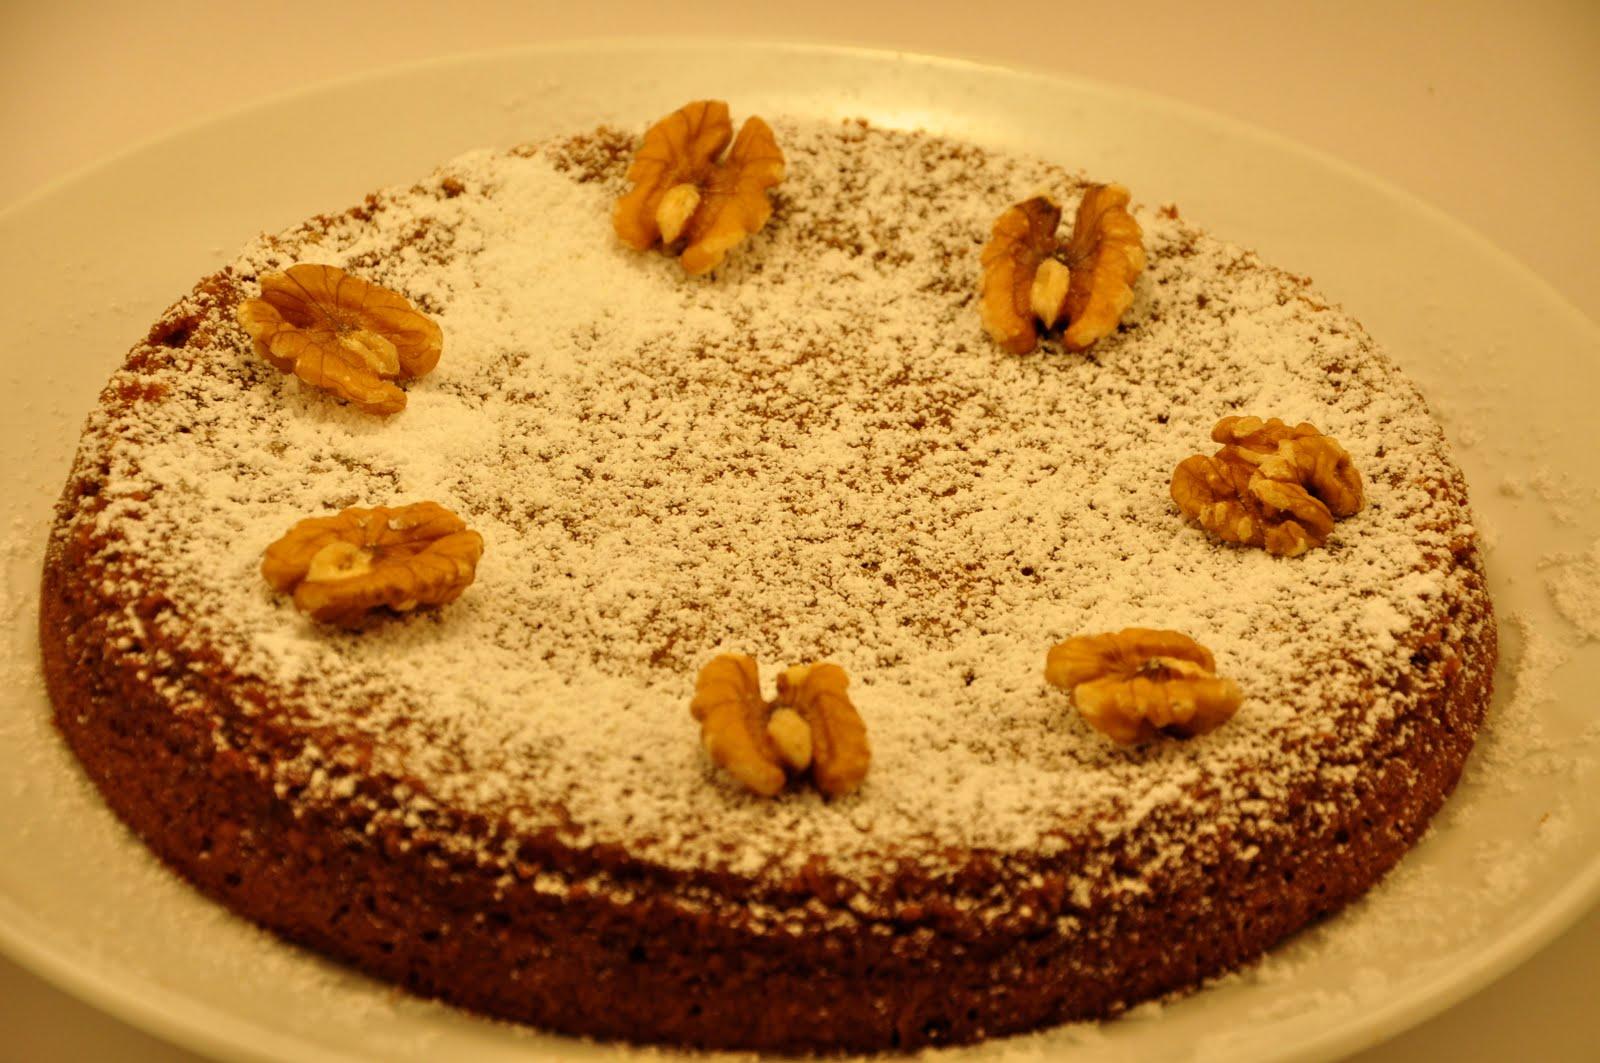 BAKE IT OFF: French Perigordine Walnut Cake